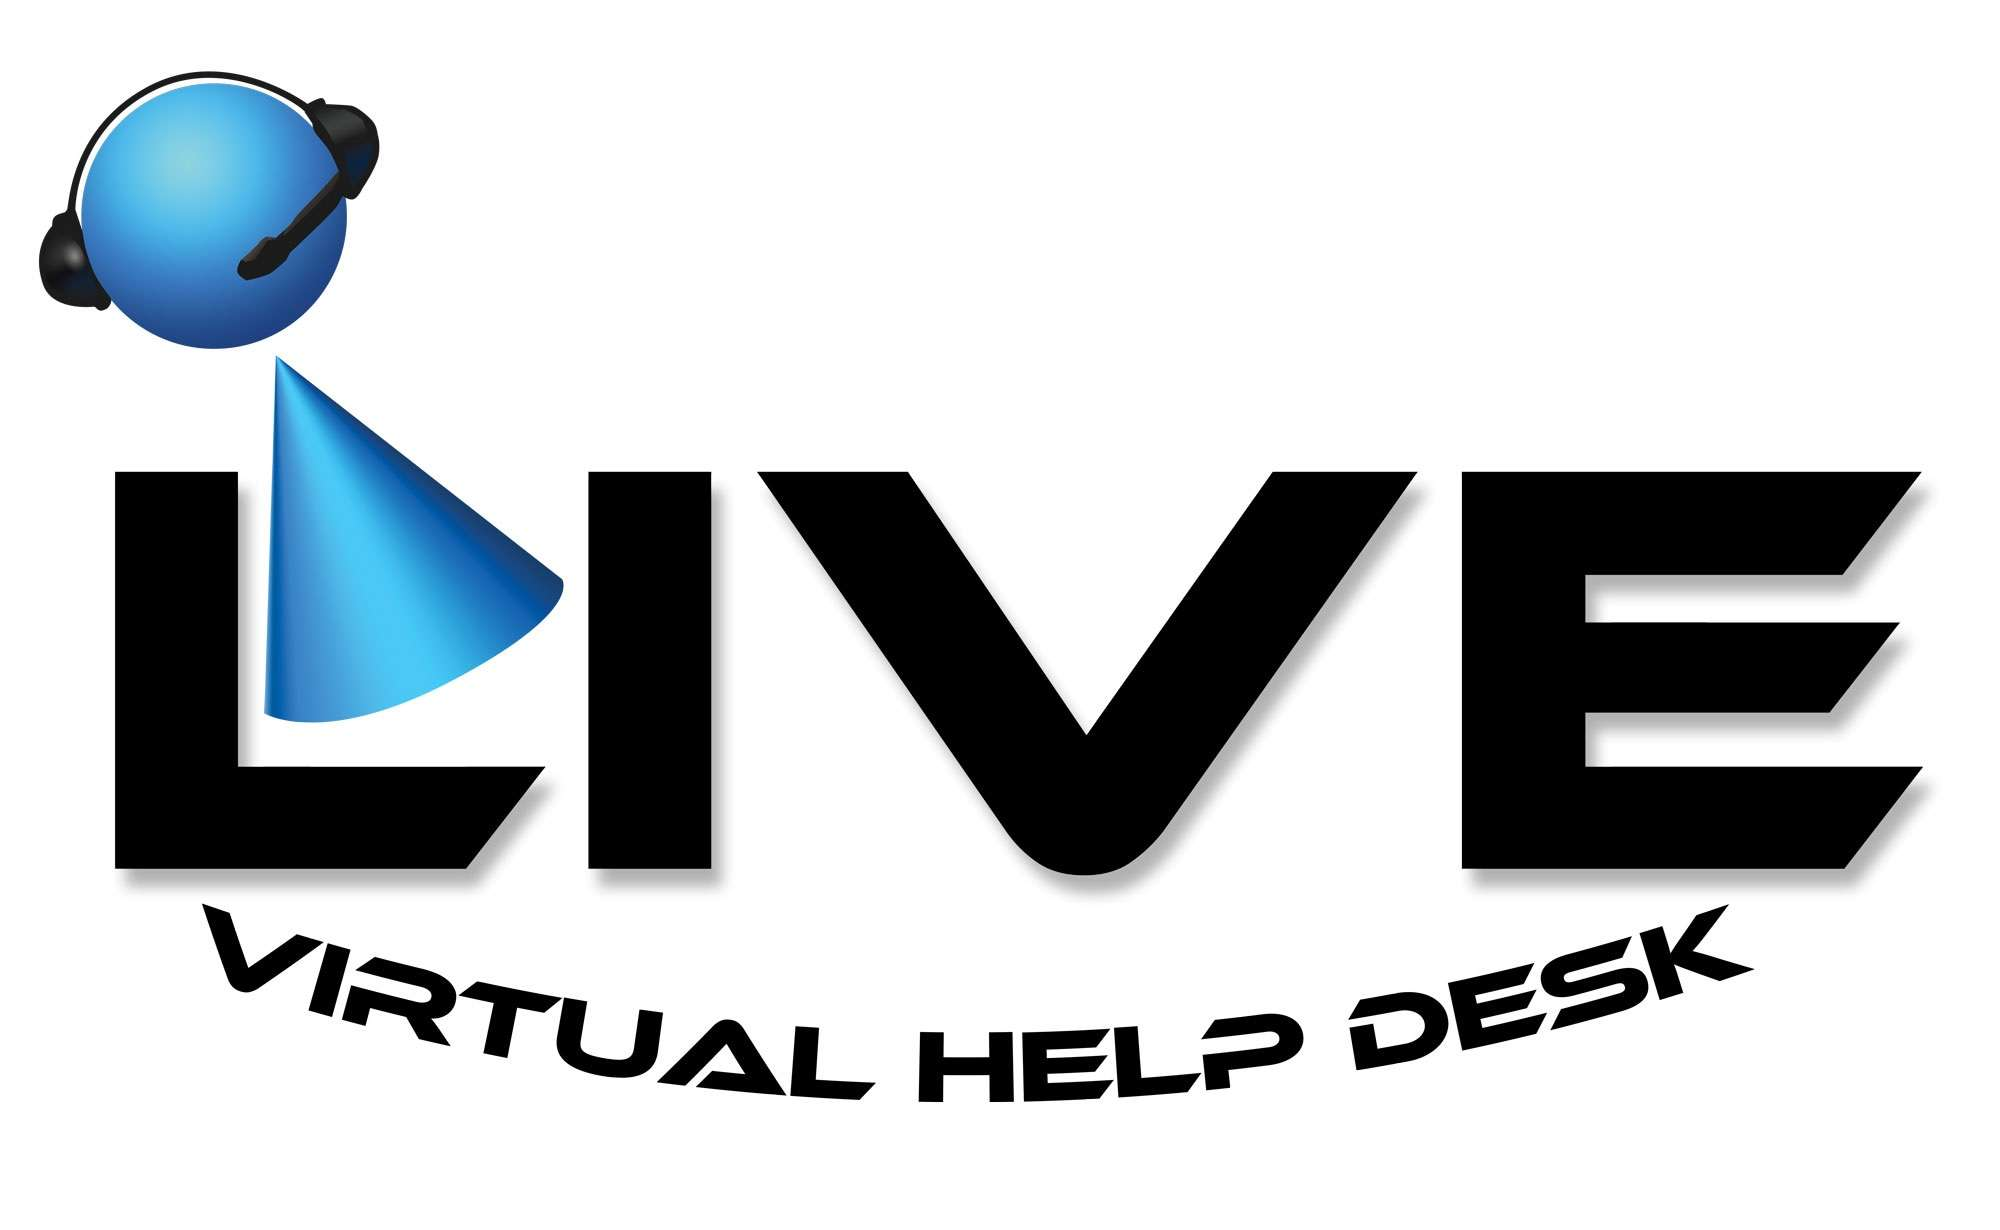 live virtual help desk review